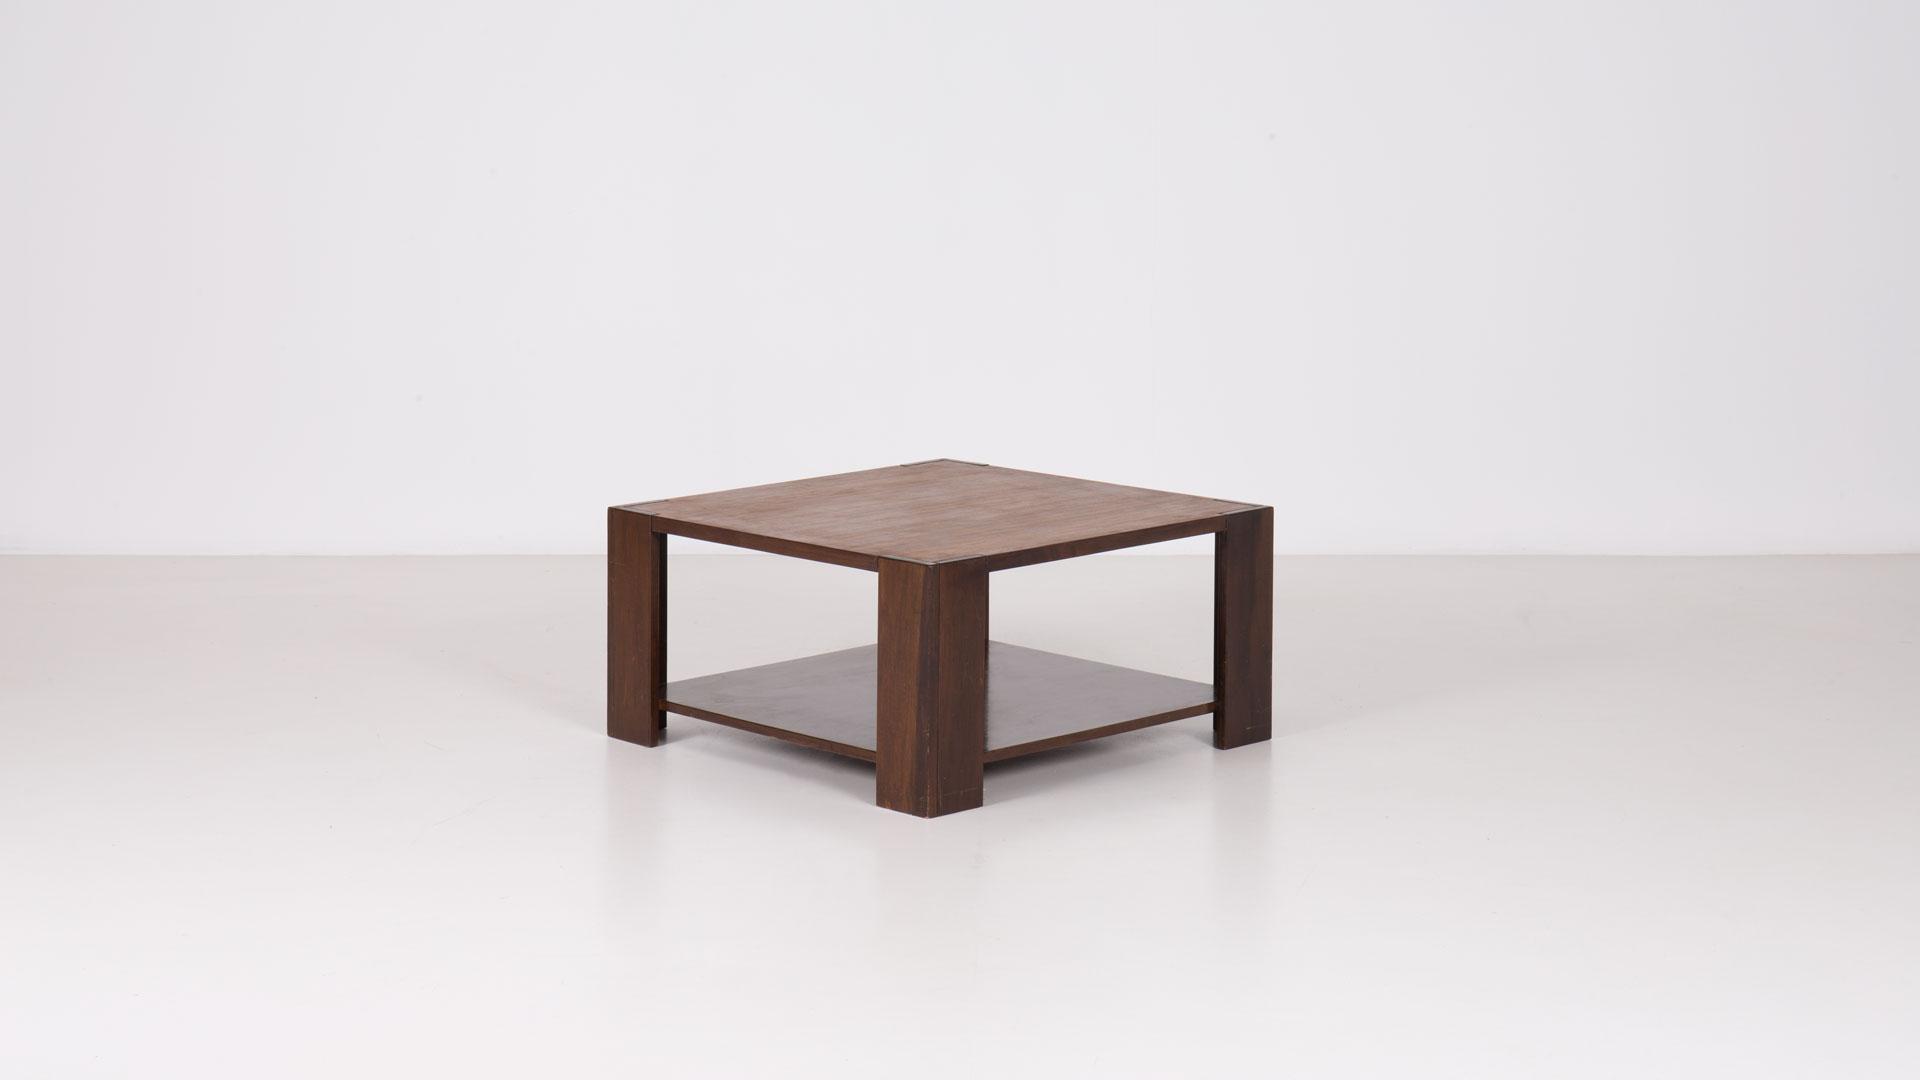 Bastiano low table by Tobia Scarpa | Paradisoterrestre